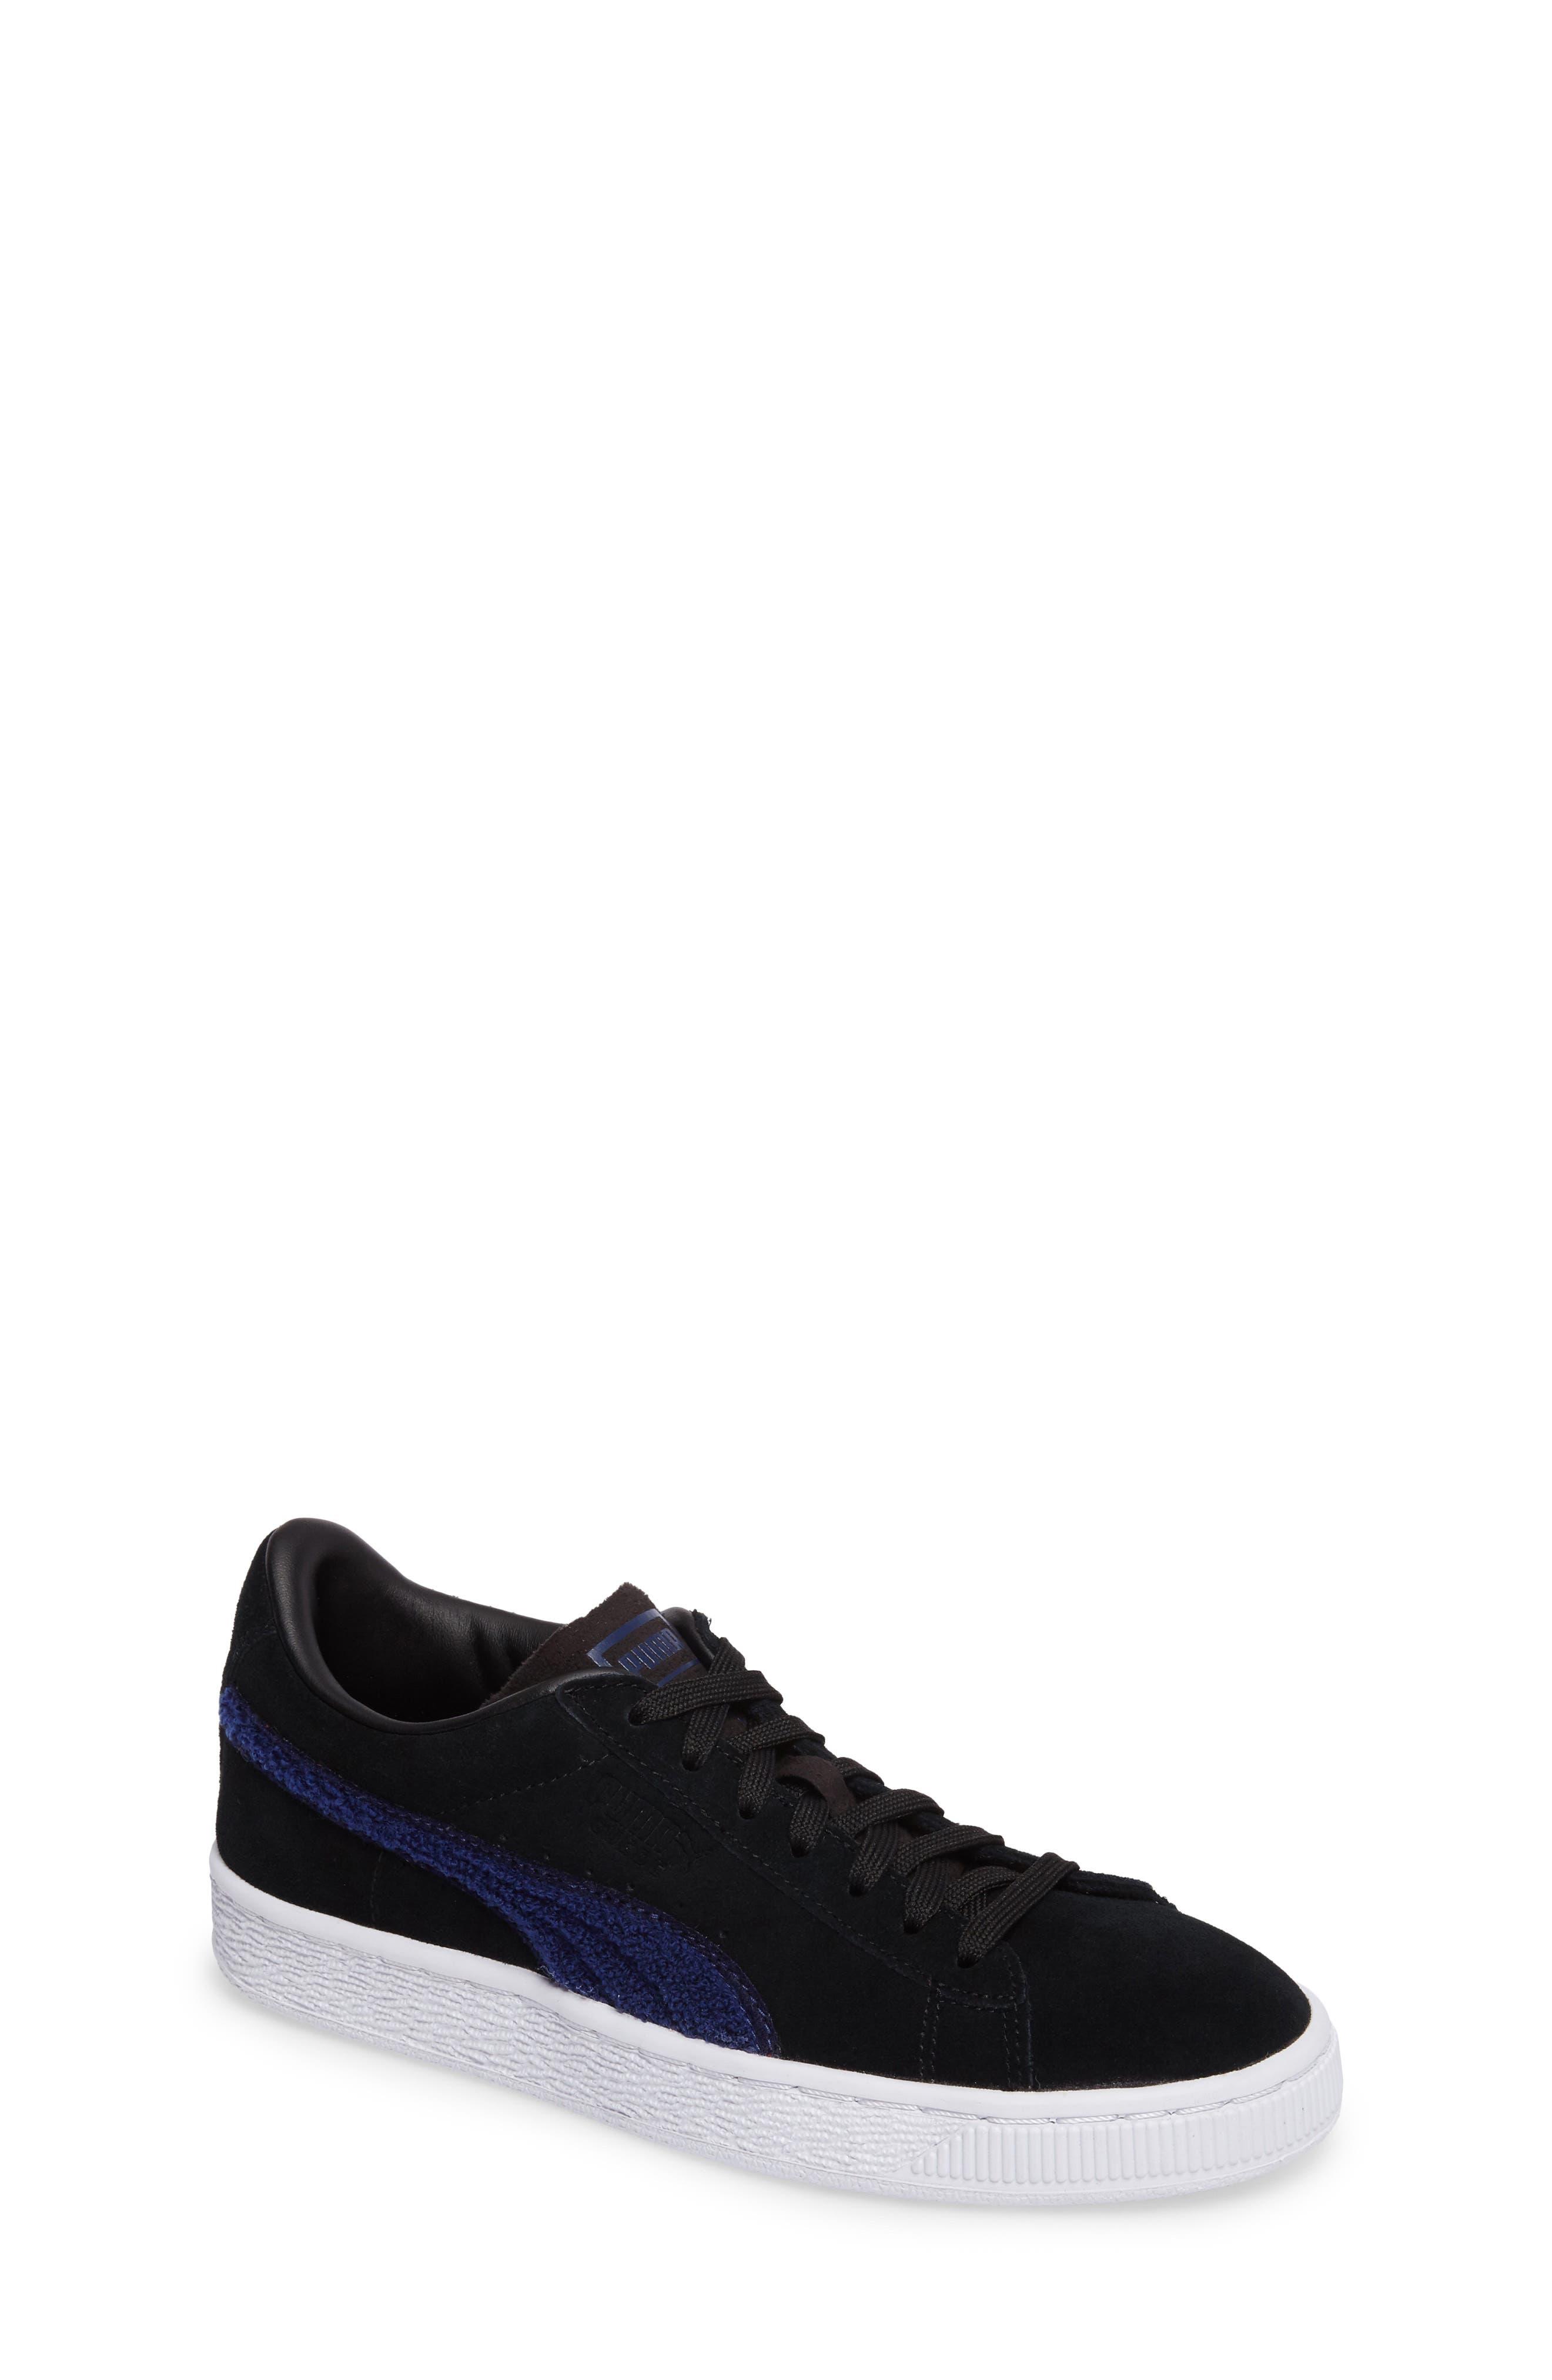 Classic Terry Jr Sneaker,                             Main thumbnail 1, color,                             Black